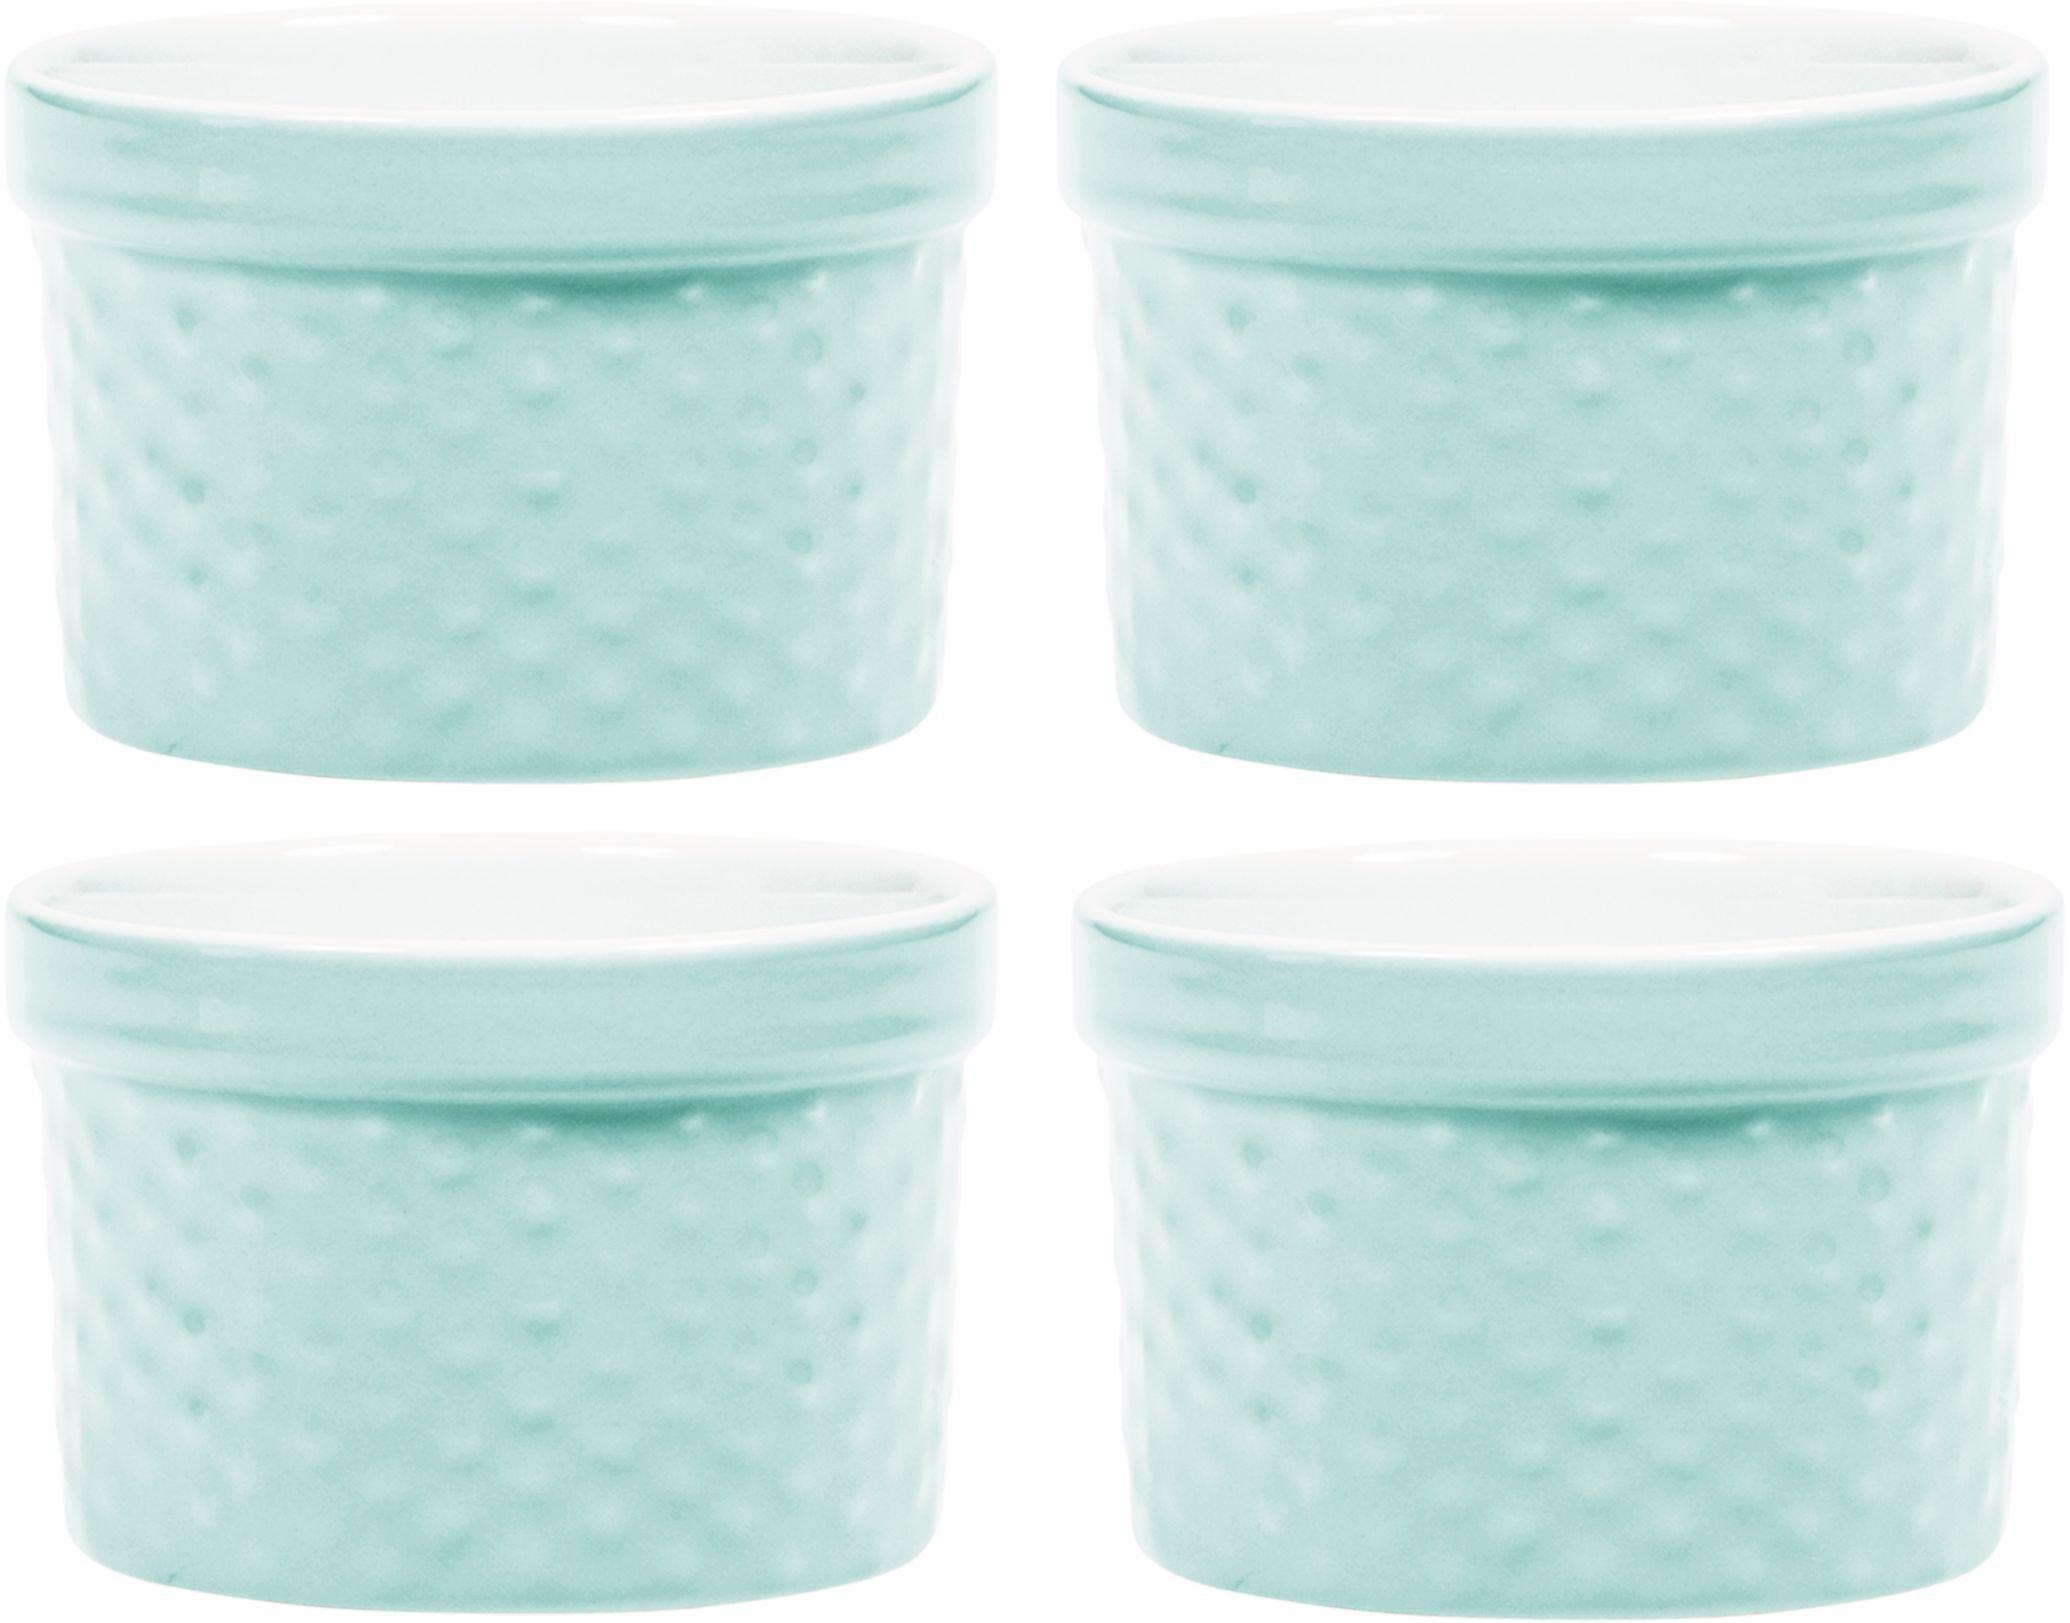 Palais Dinnerware Ramekins Collection Porcelain Soufle Dishes (6 Oz - Set of 4, Light Blue - Dots Finish)